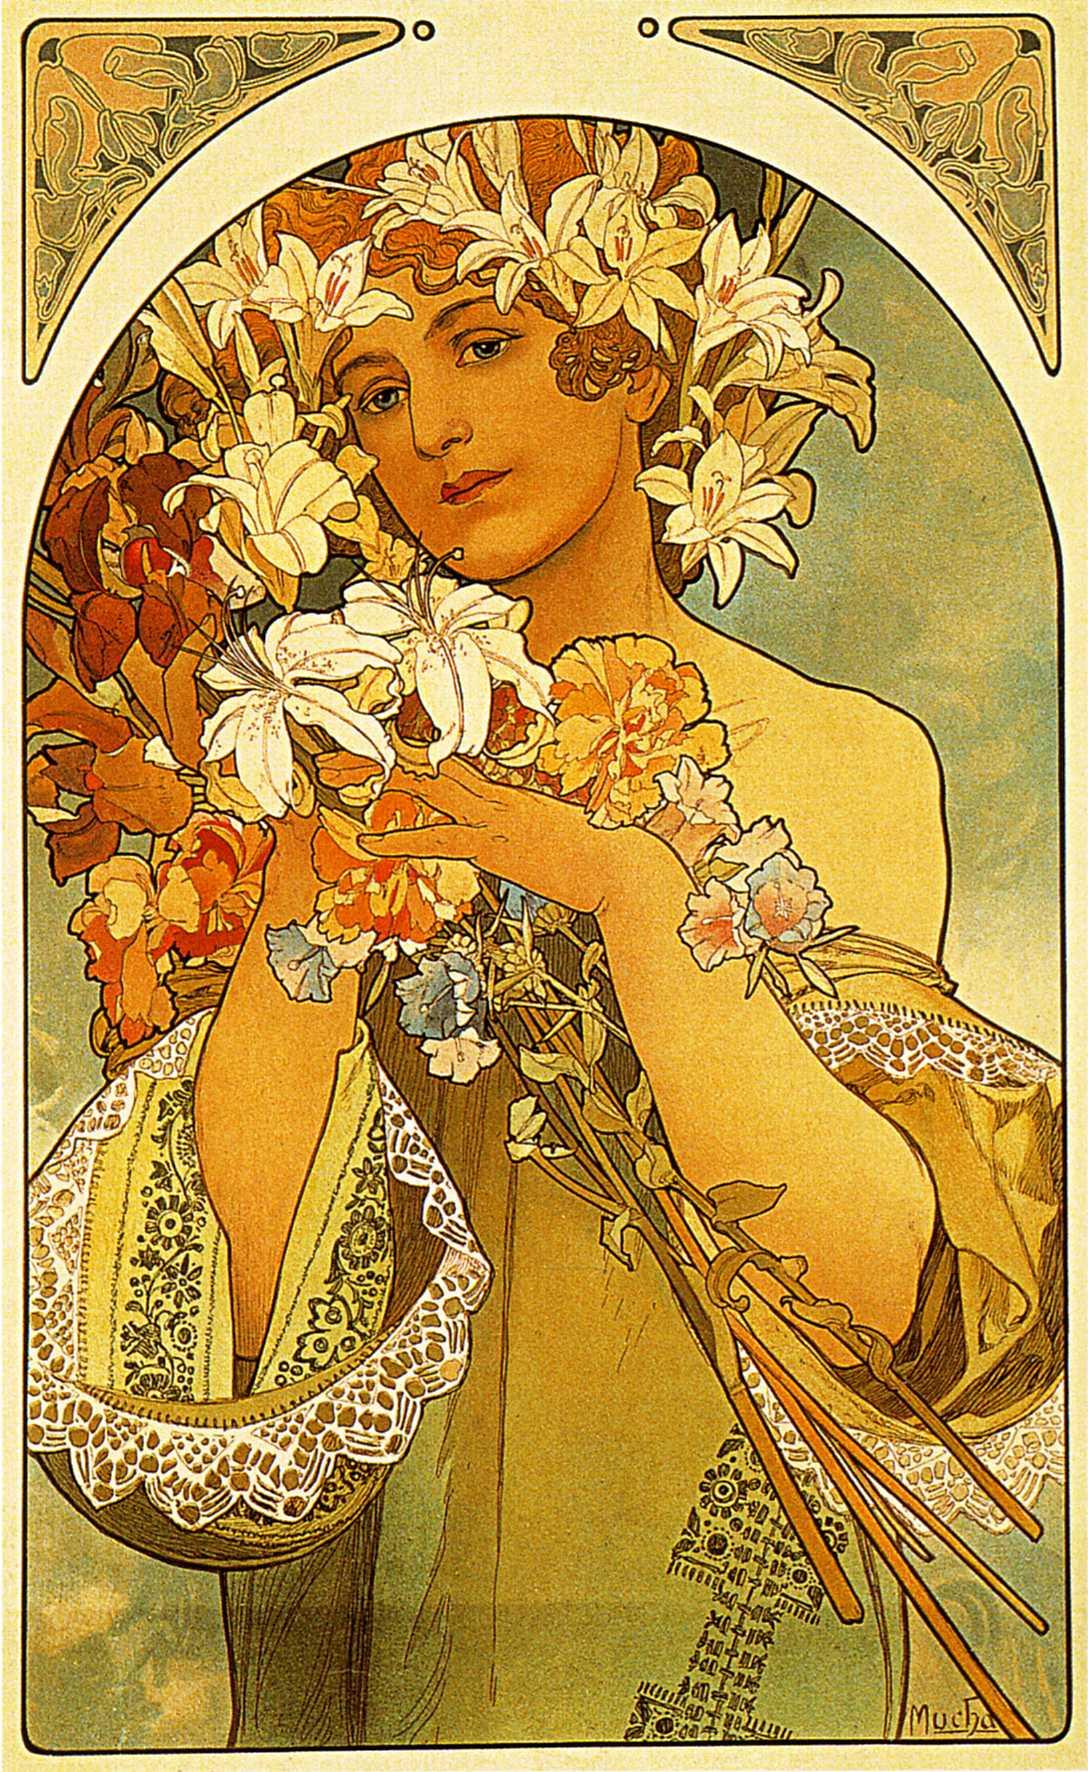 Flower, 1897 - Alphonse Mucha - WikiArt.org